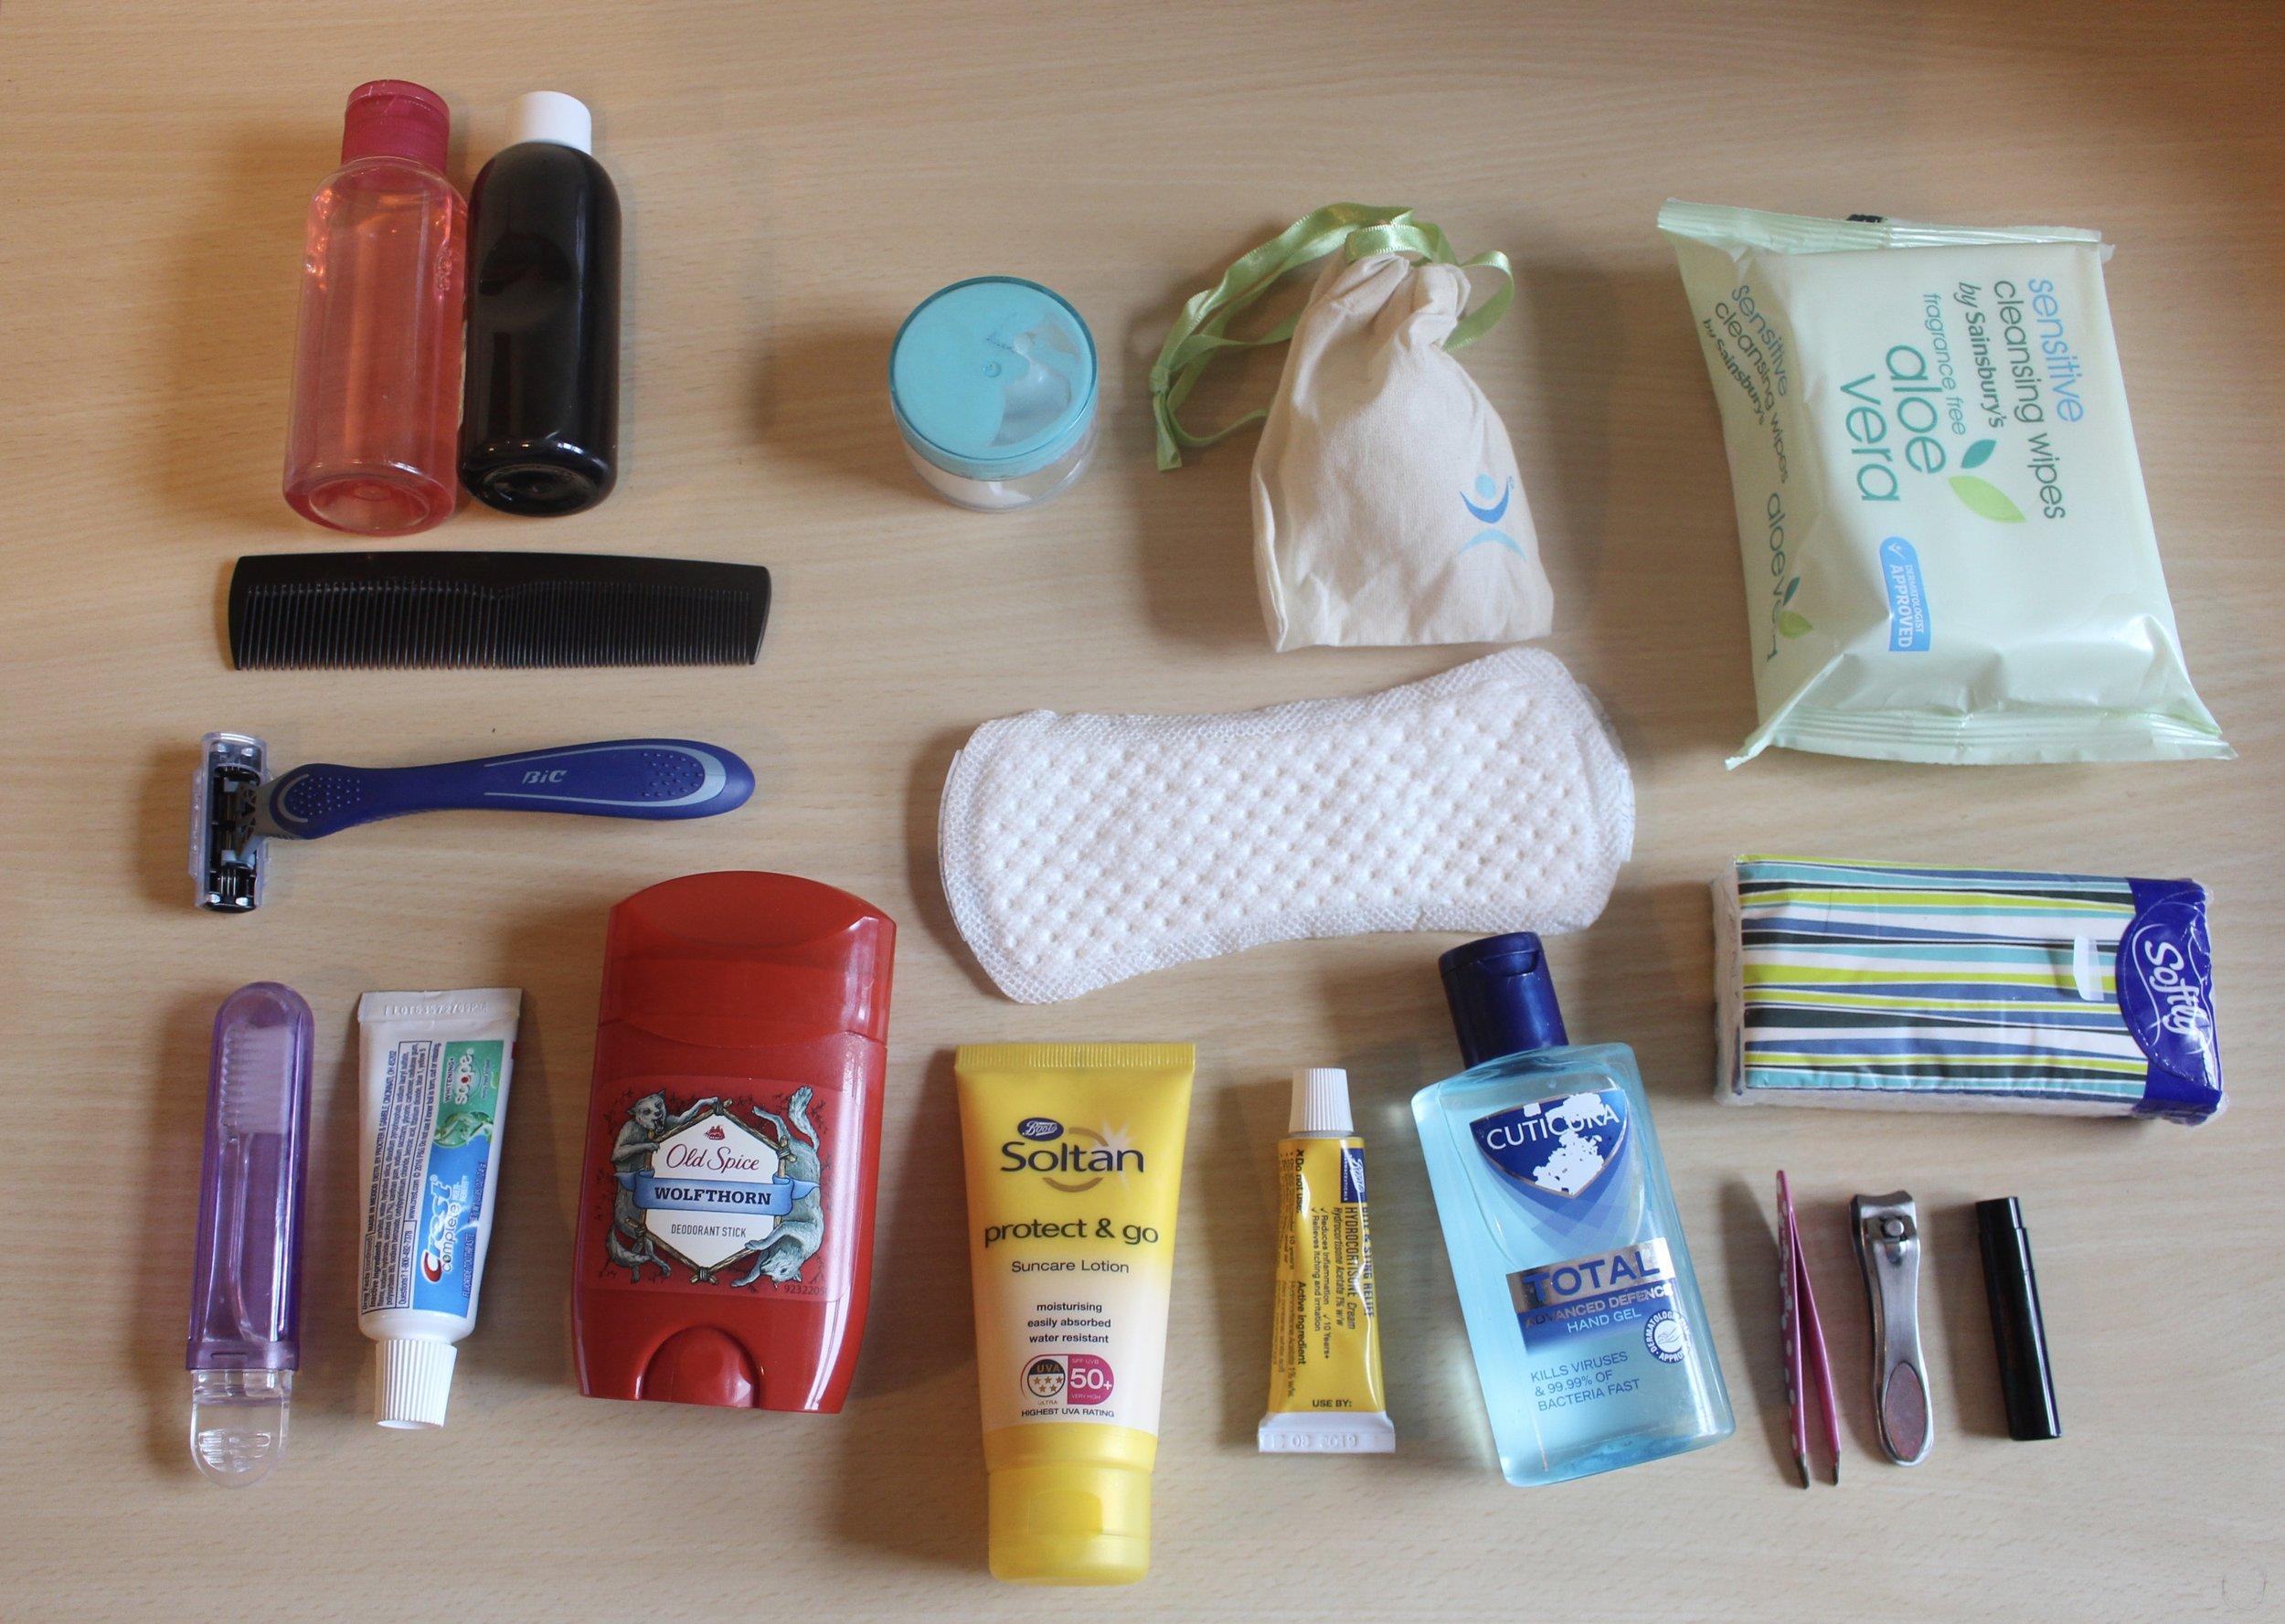 Toiletries packing list